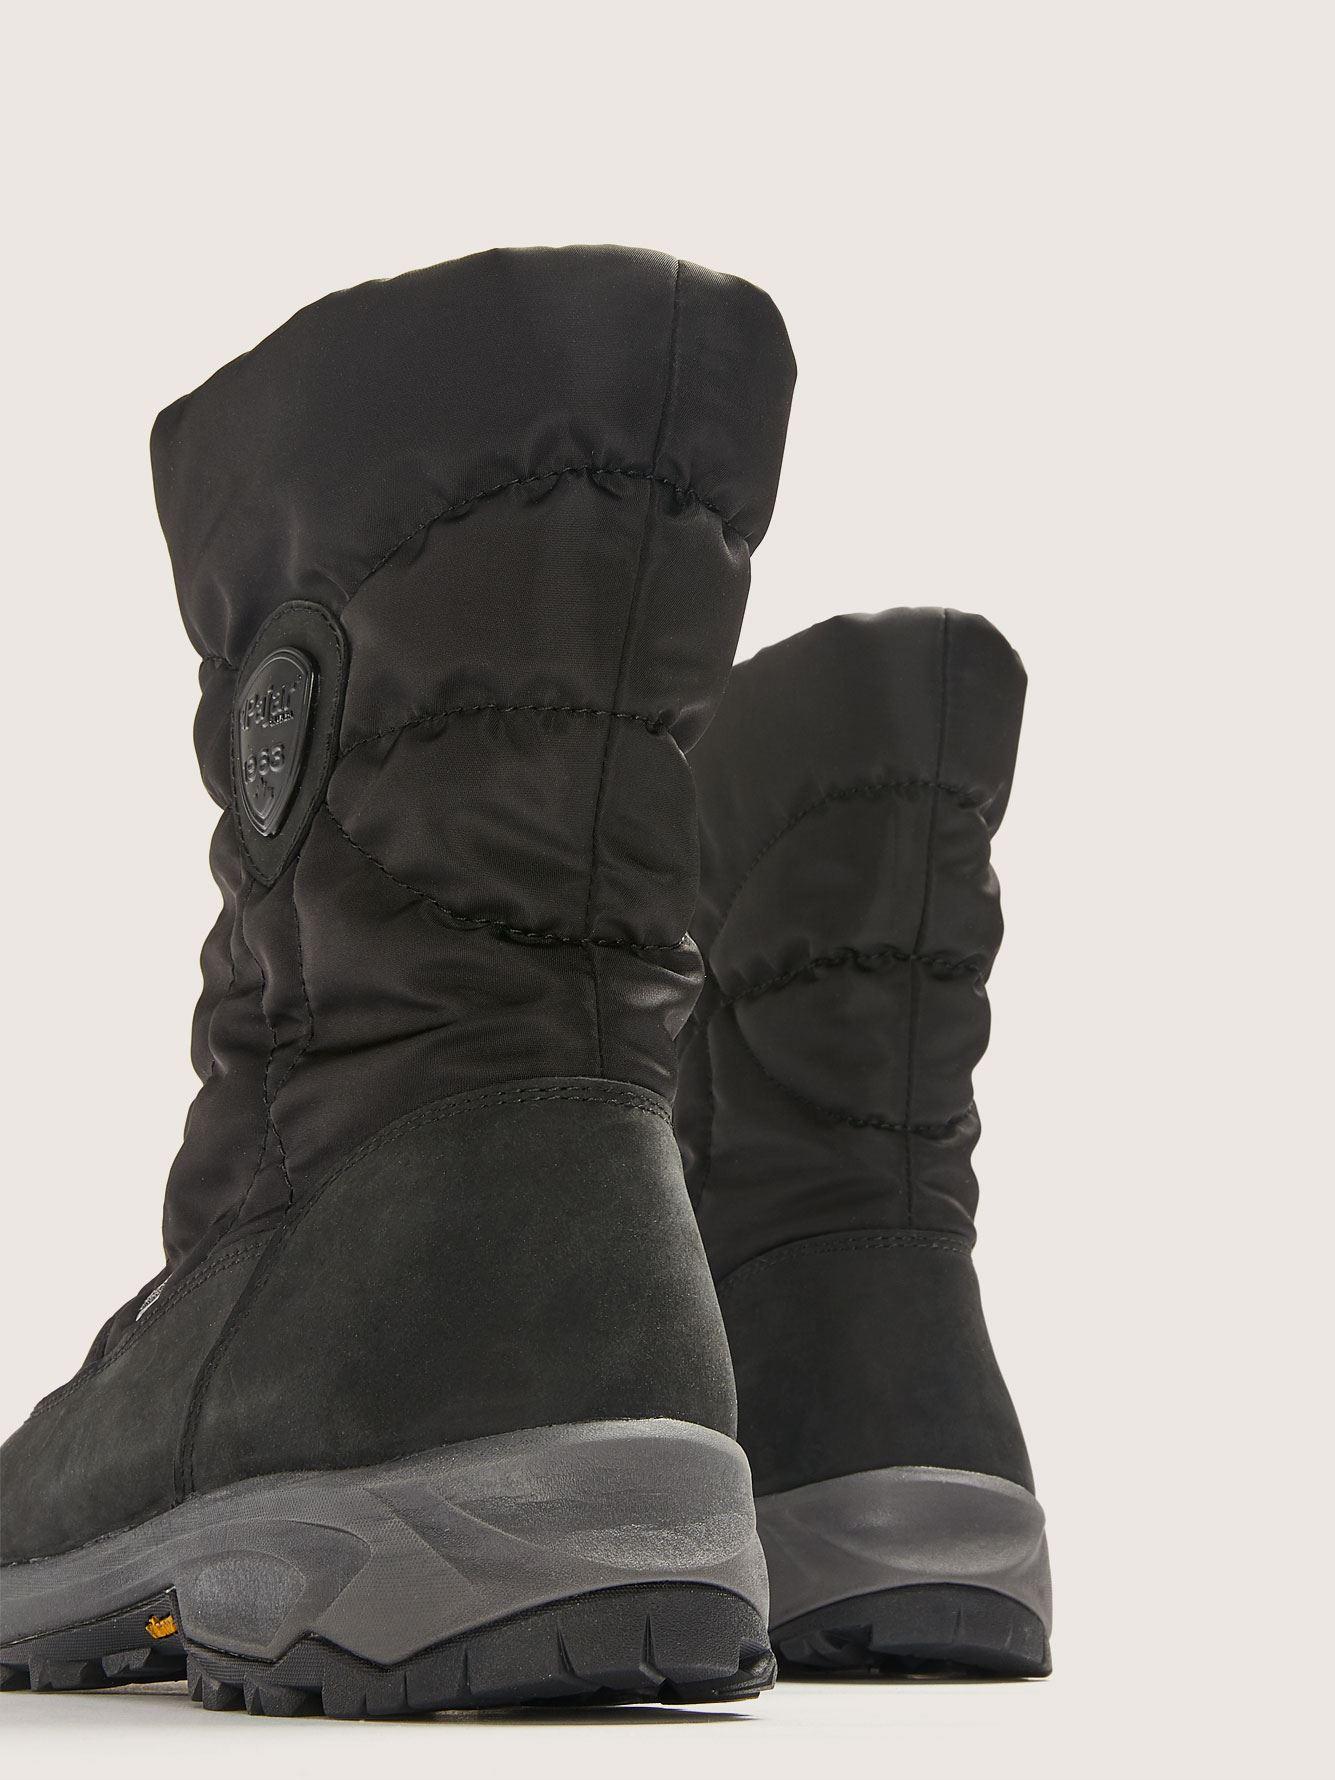 Wide Tacita Anti-Slip Winter Boot - Pajar